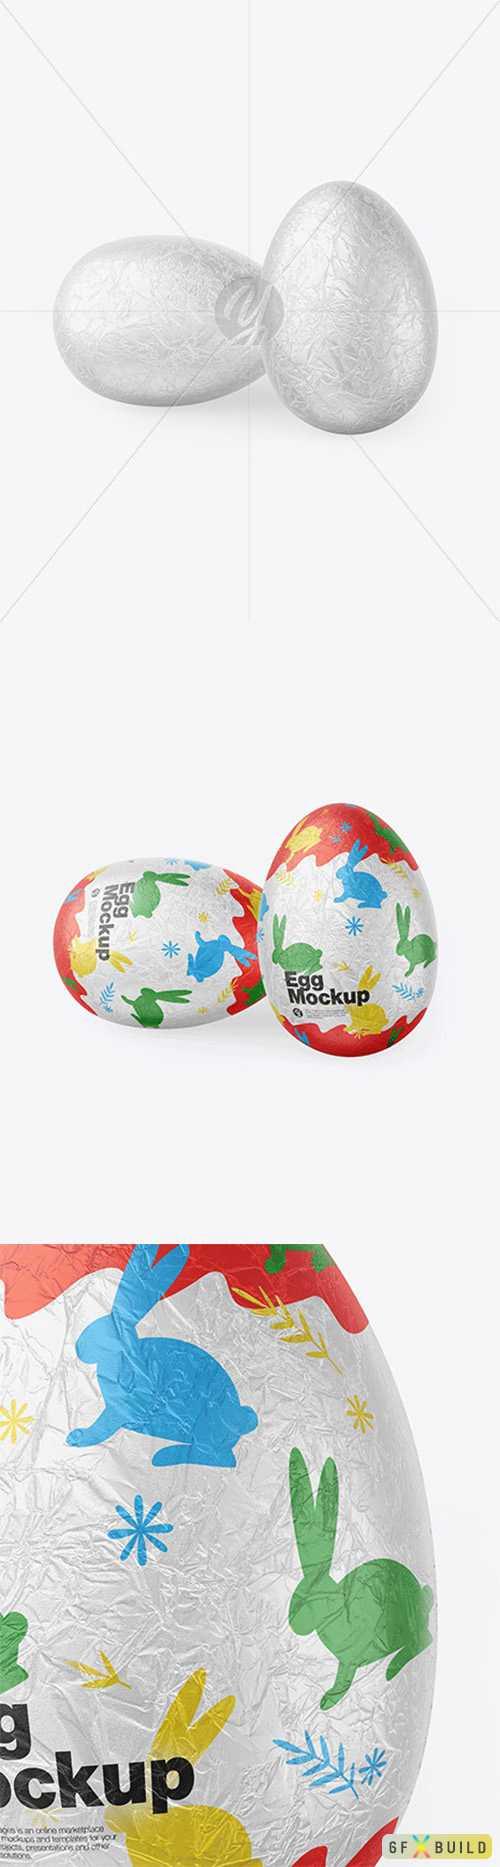 Two Eggs in Metallic Foil Mockup 78218 TIF